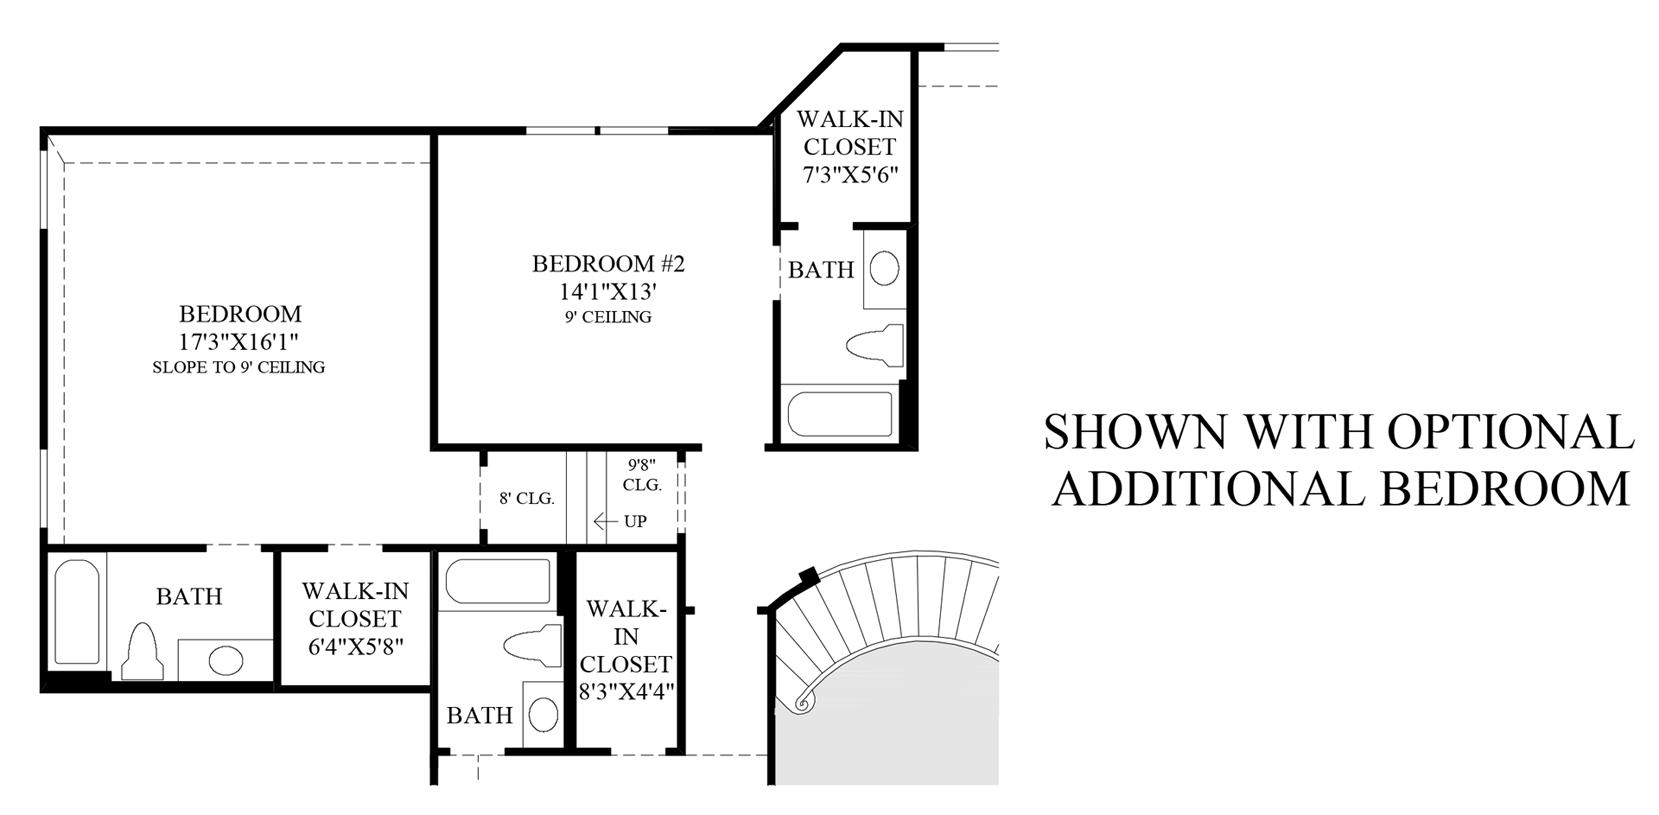 southlake meadows the kingston home design